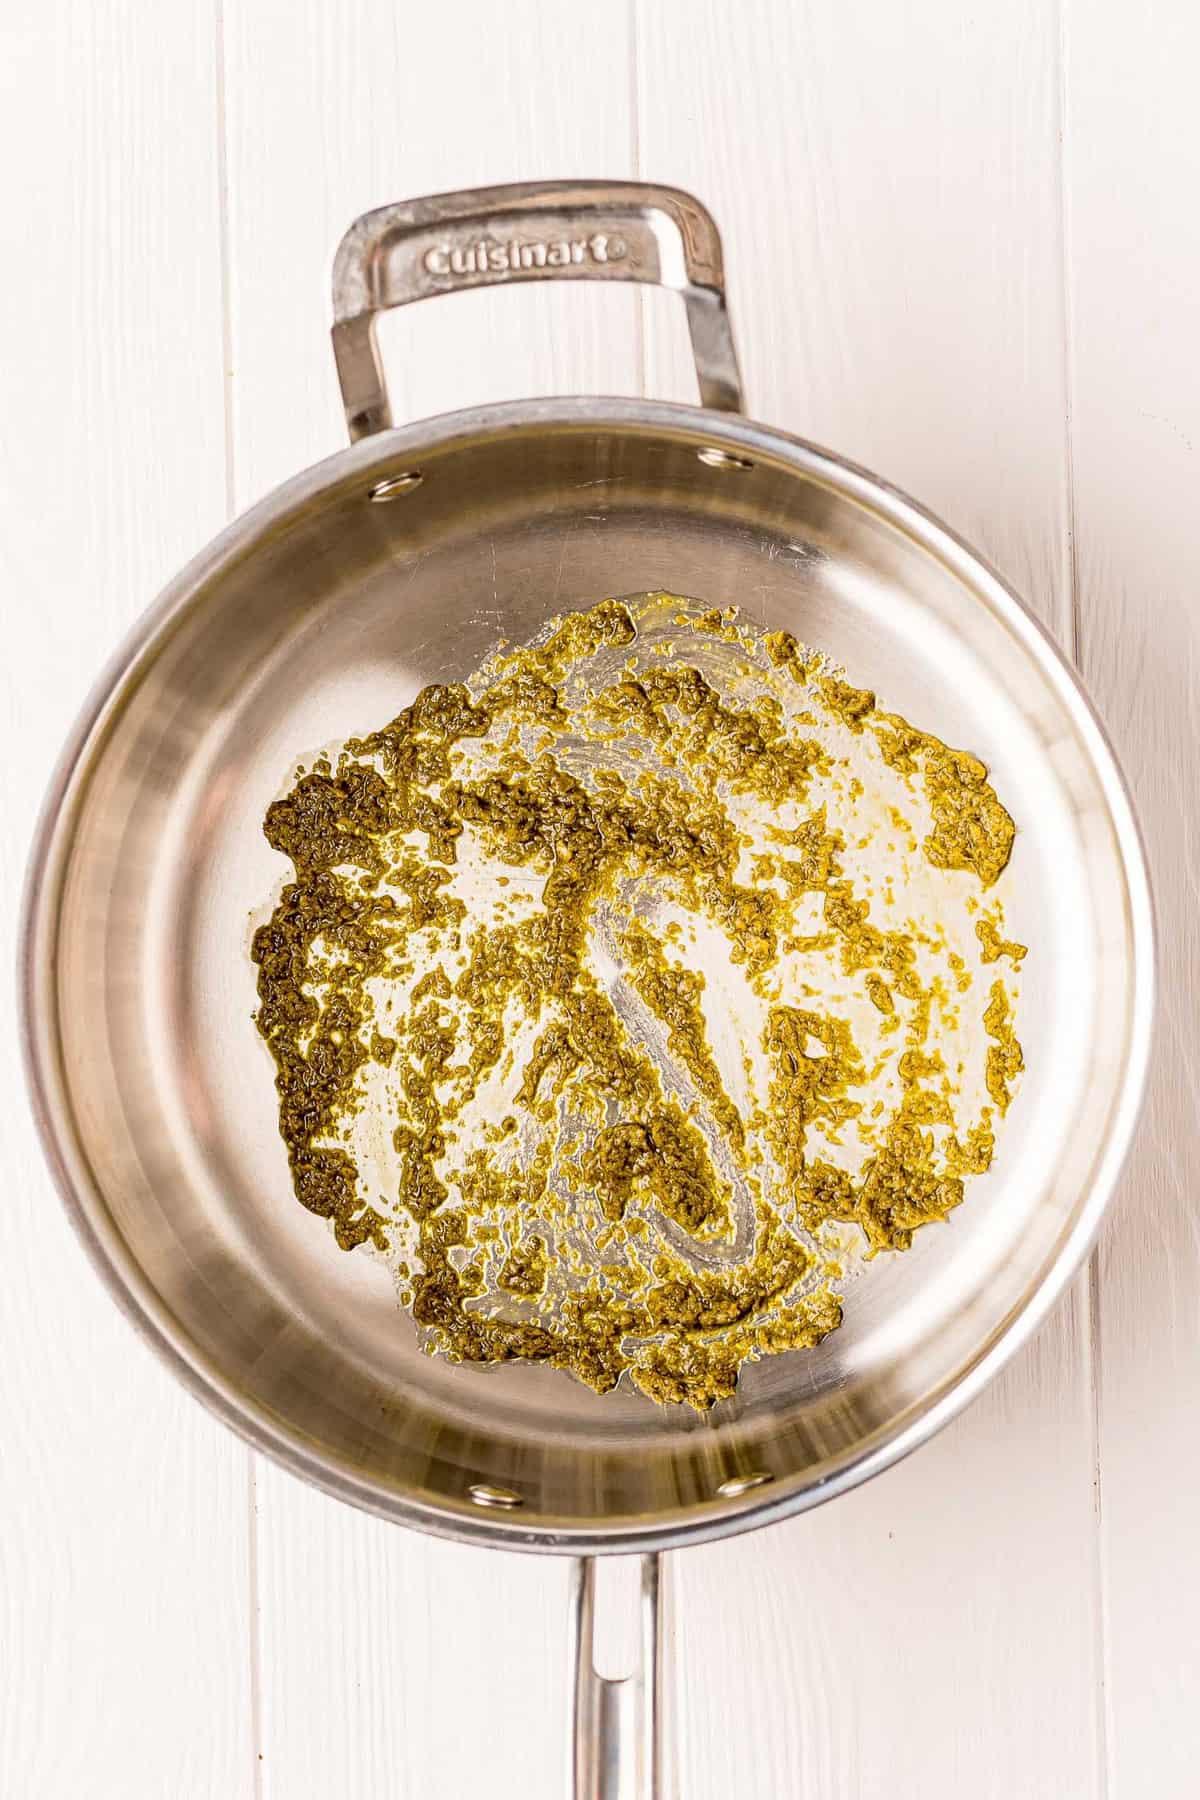 Pesto in a frying pan